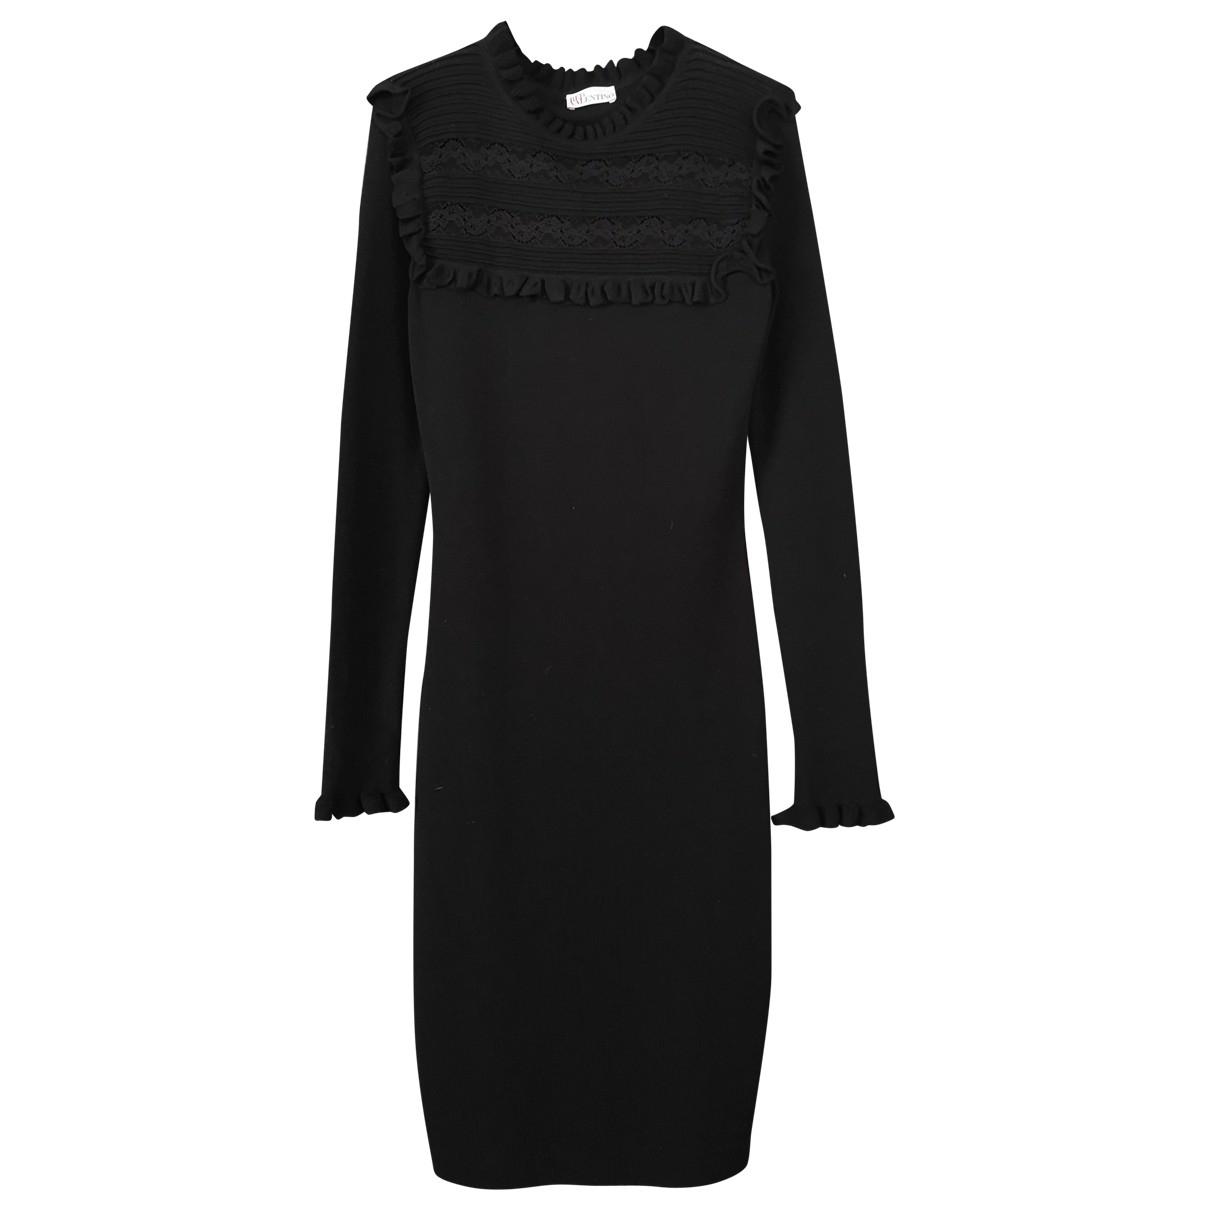 Red Valentino Garavani \N Black Wool dress for Women L International